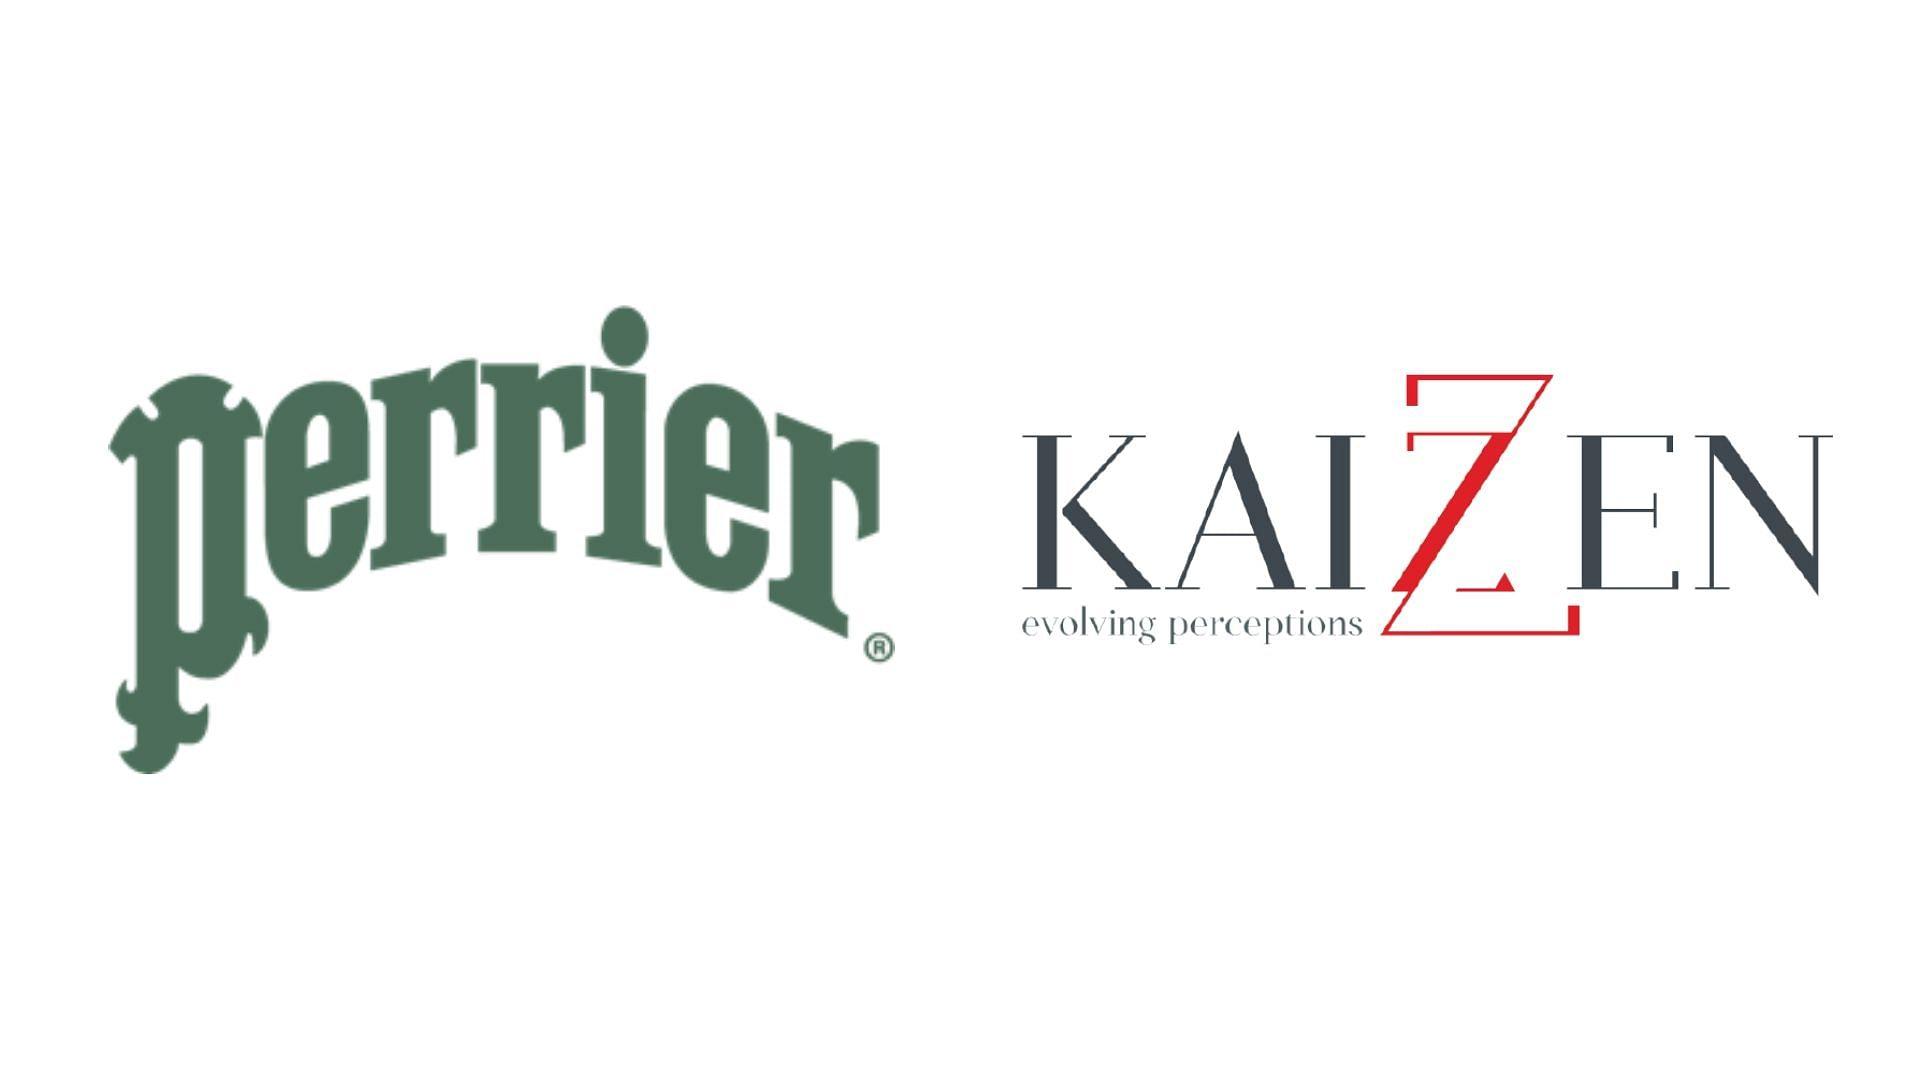 kaizzen?blur=25